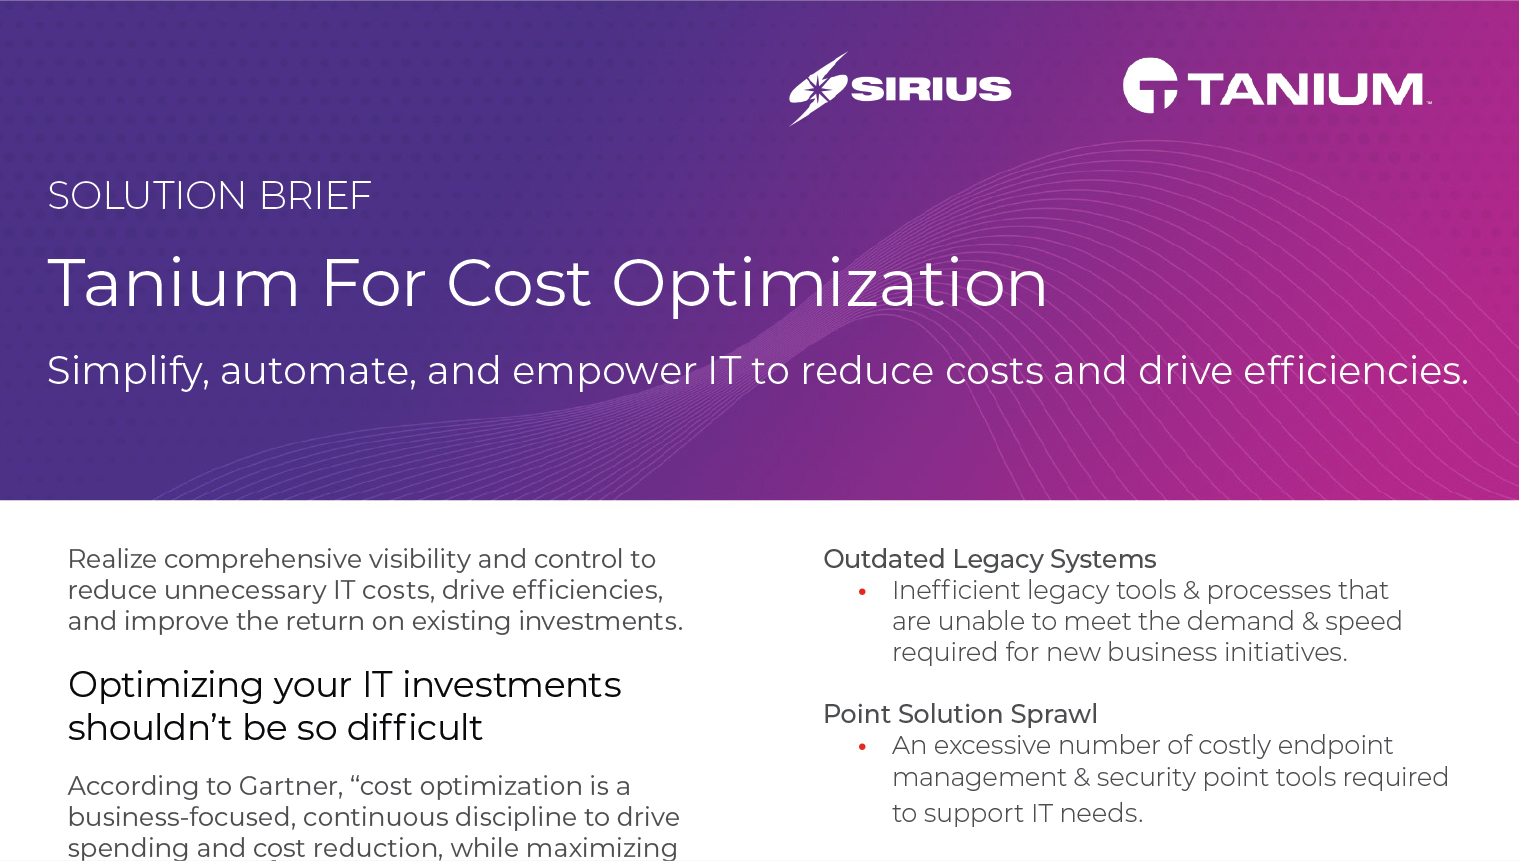 Solution Brief: Tanium For Cost Optimization